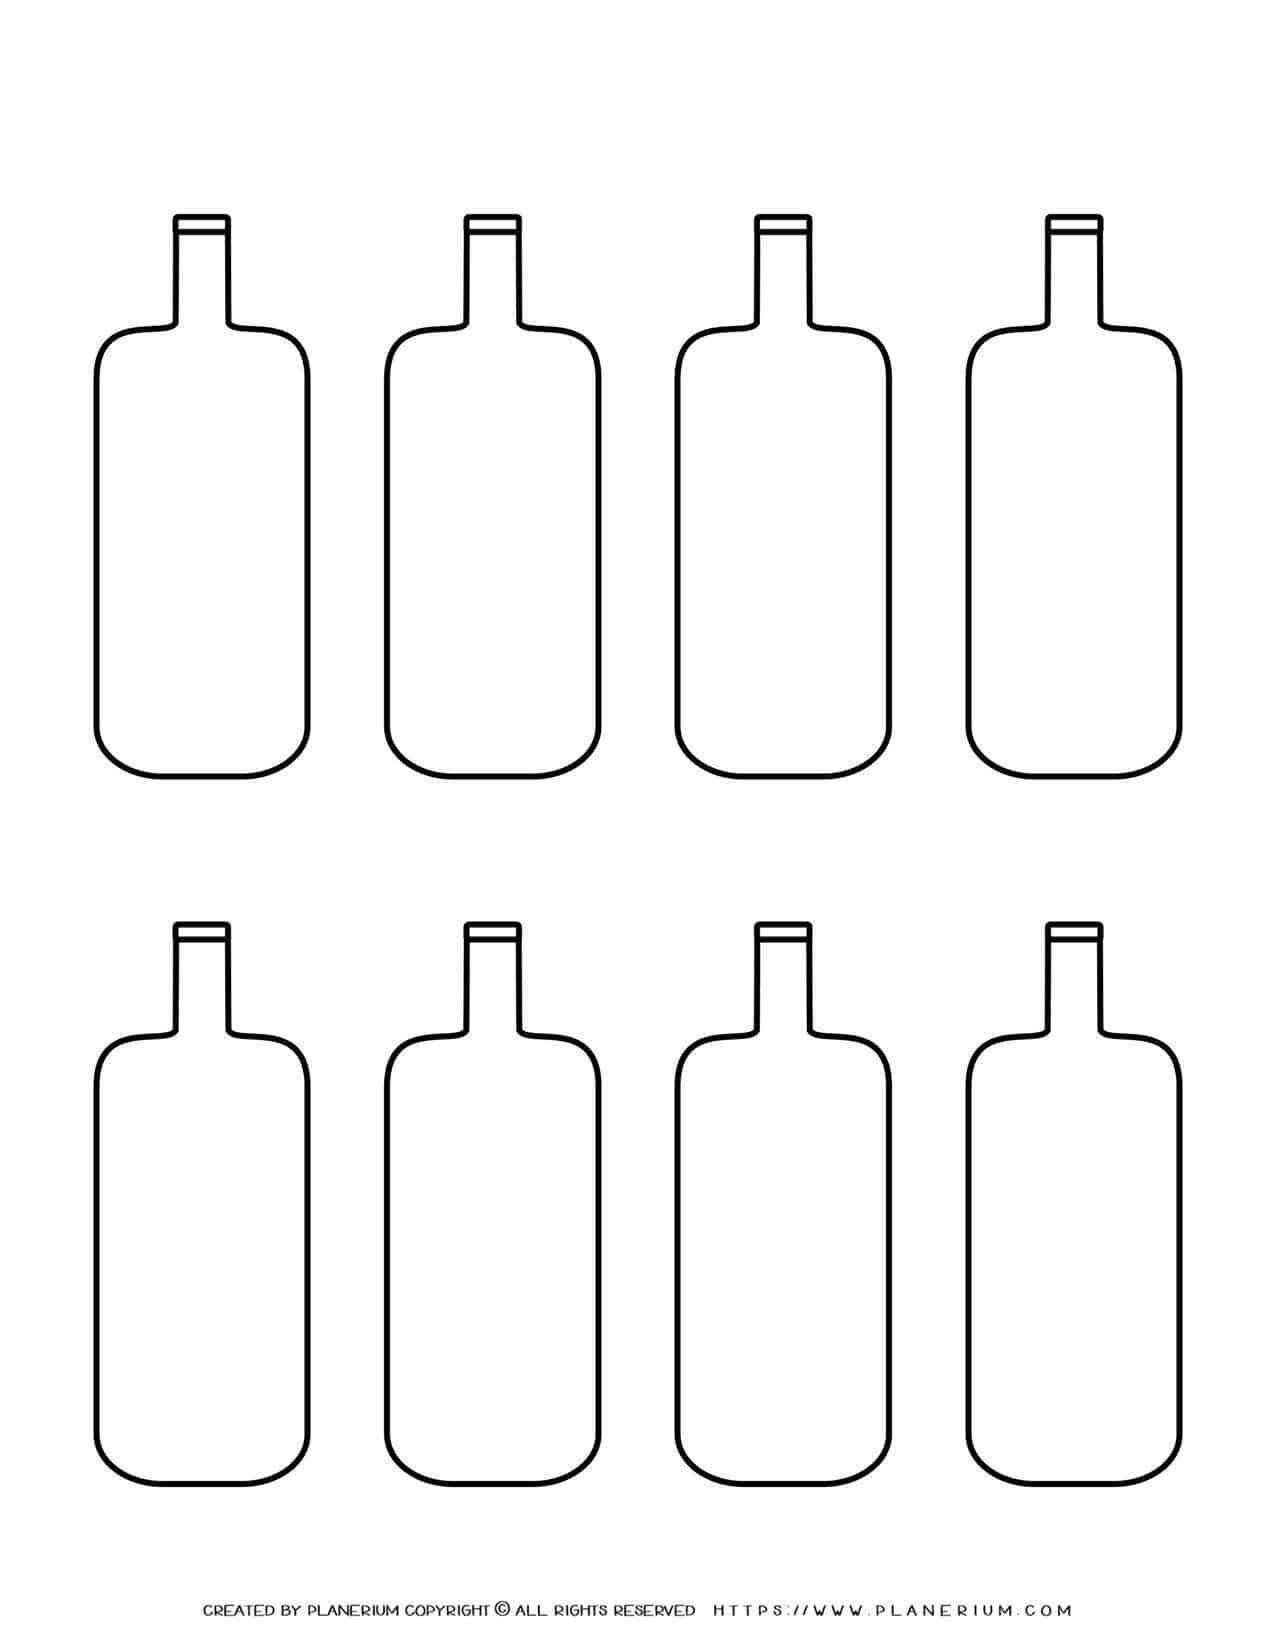 Templates - Eight Wine Bottles | Planerium